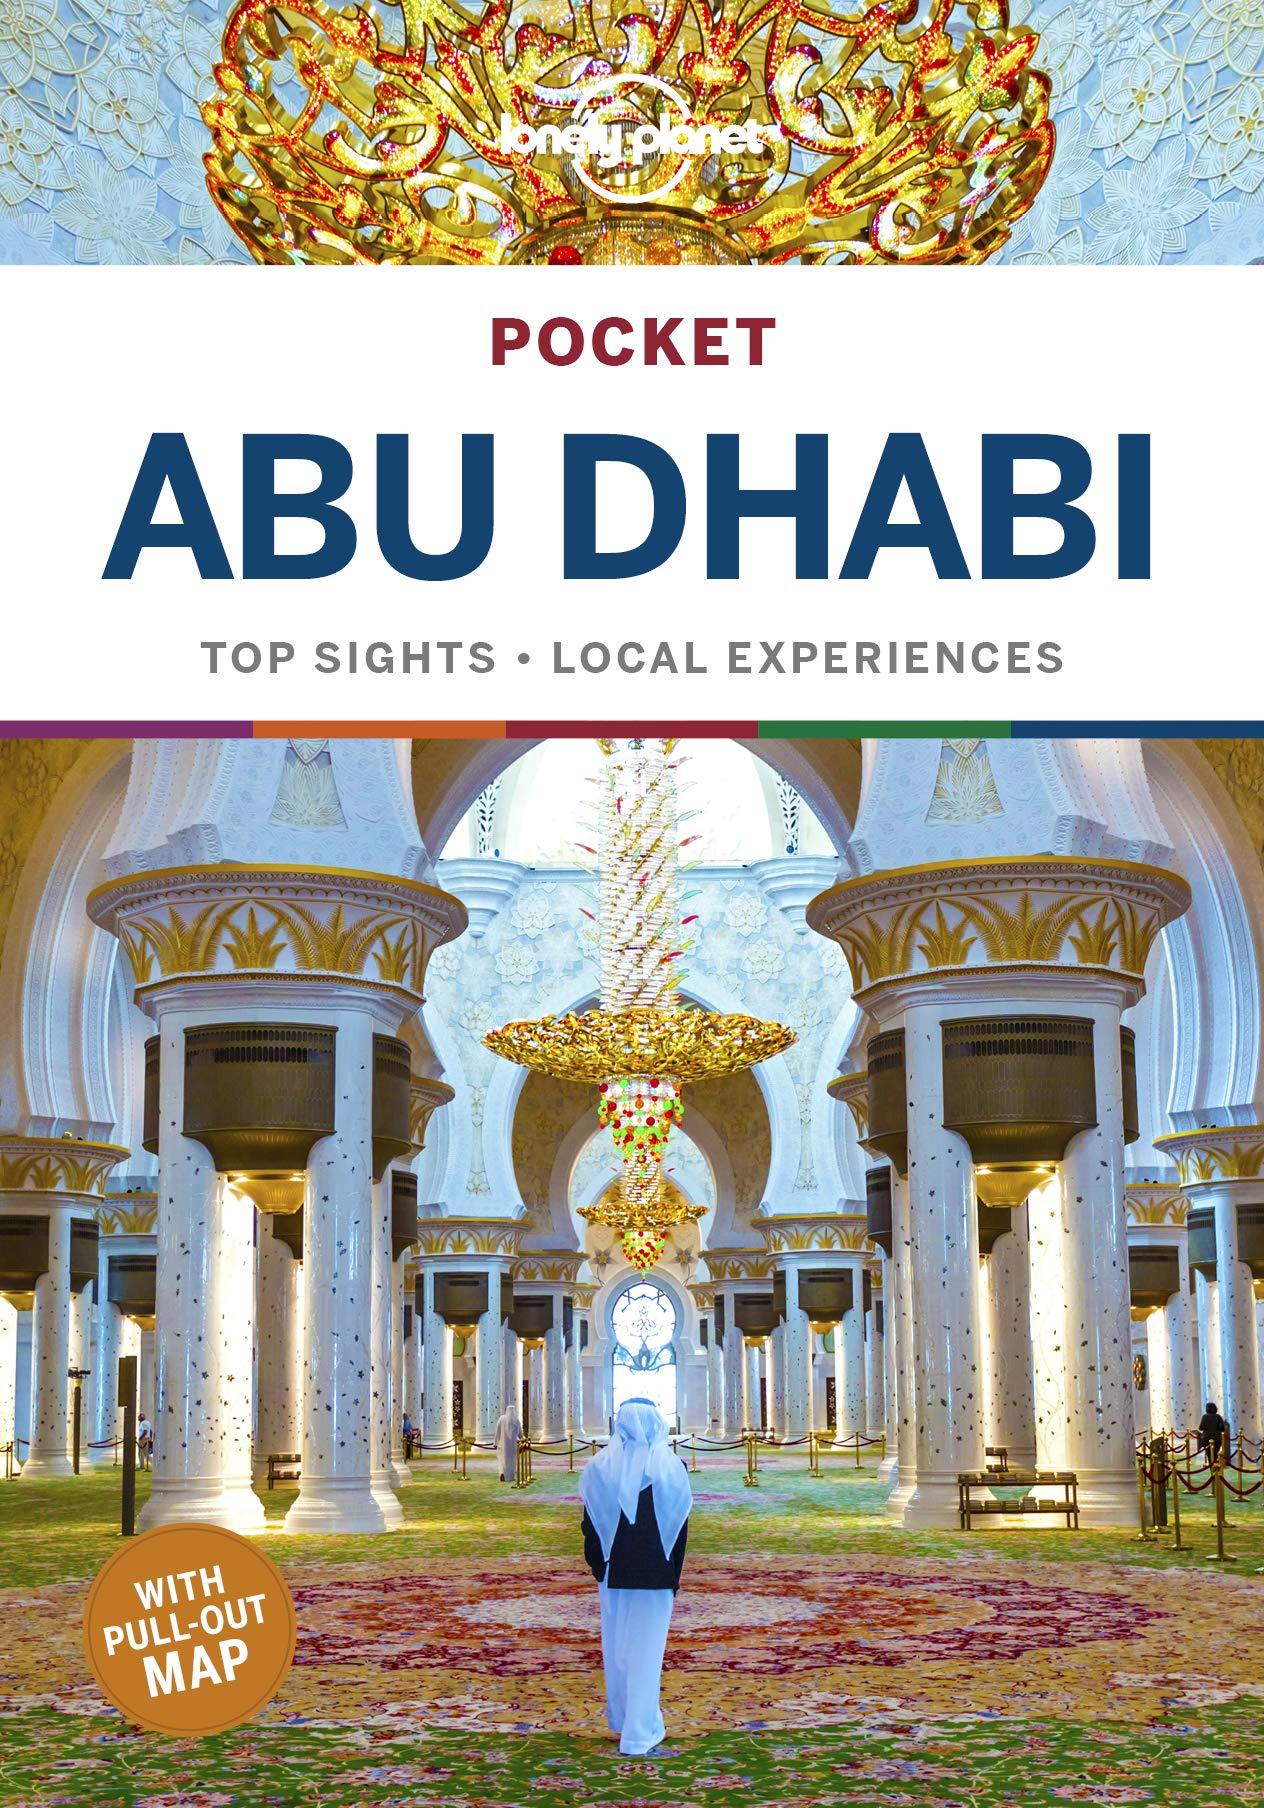 Online bestellen: Reisgids Pocket Abu Dhabi | Lonely Planet